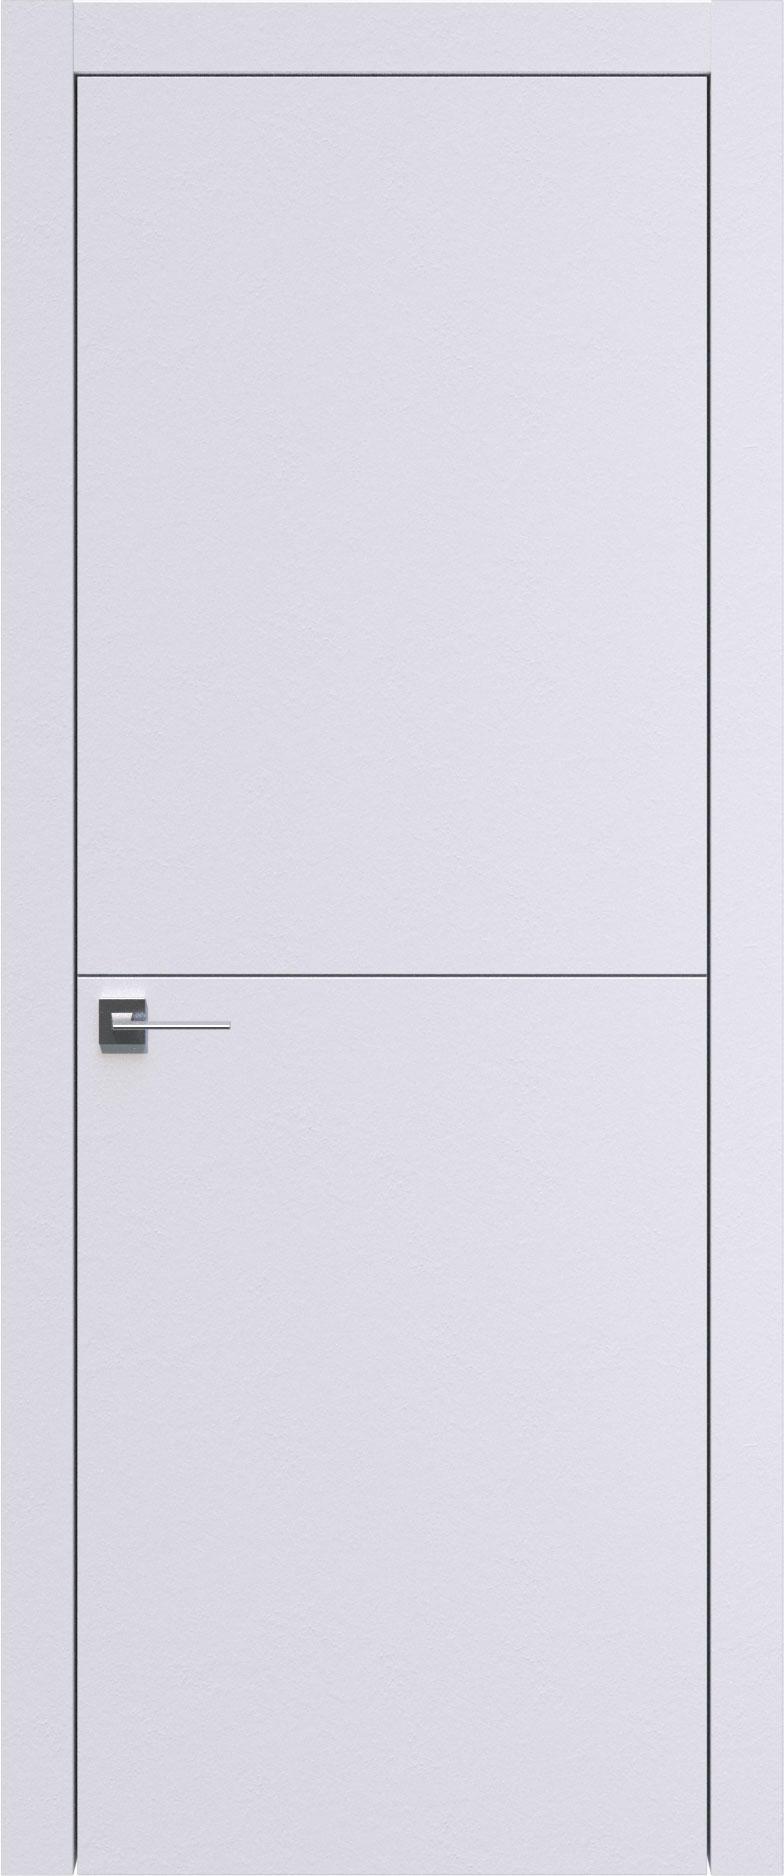 Tivoli Б-3 цвет - Арктик белый Без стекла (ДГ)